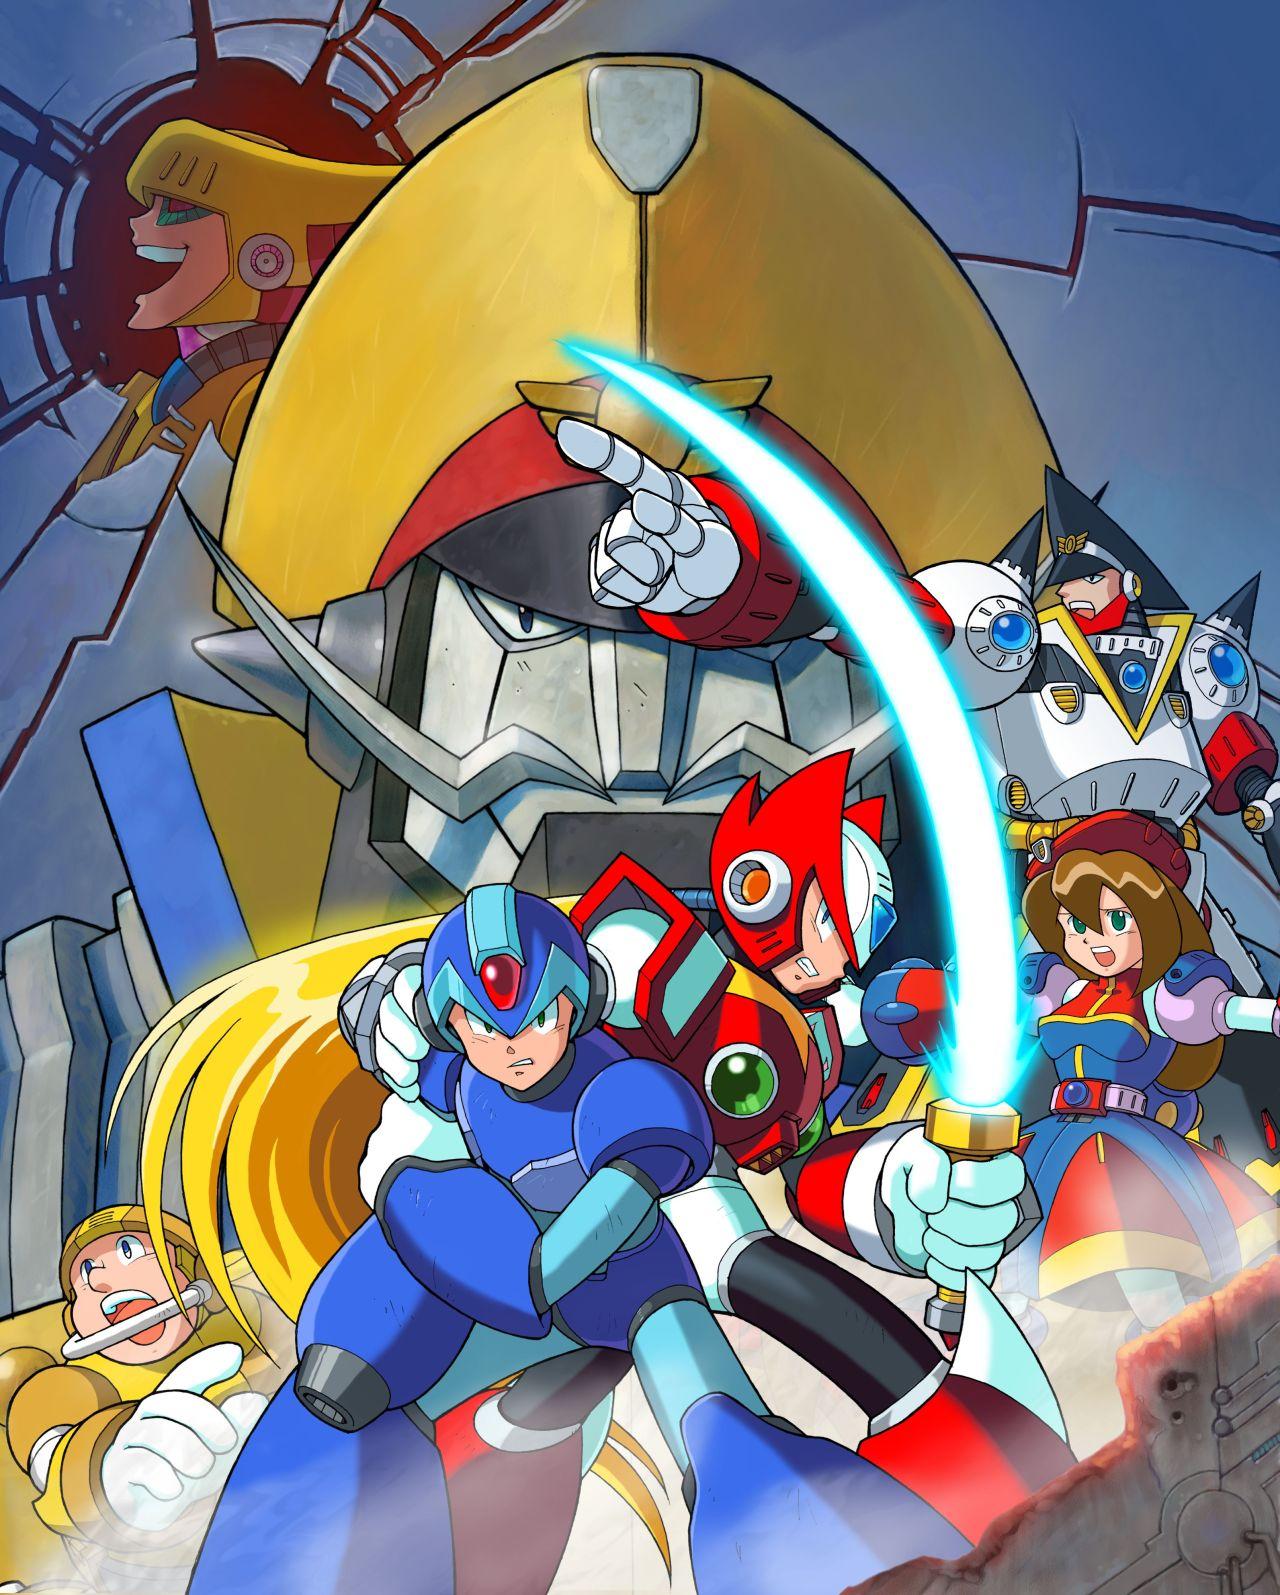 Mega man x4 mega man hq fandom powered by wikia - Megaman wikia ...